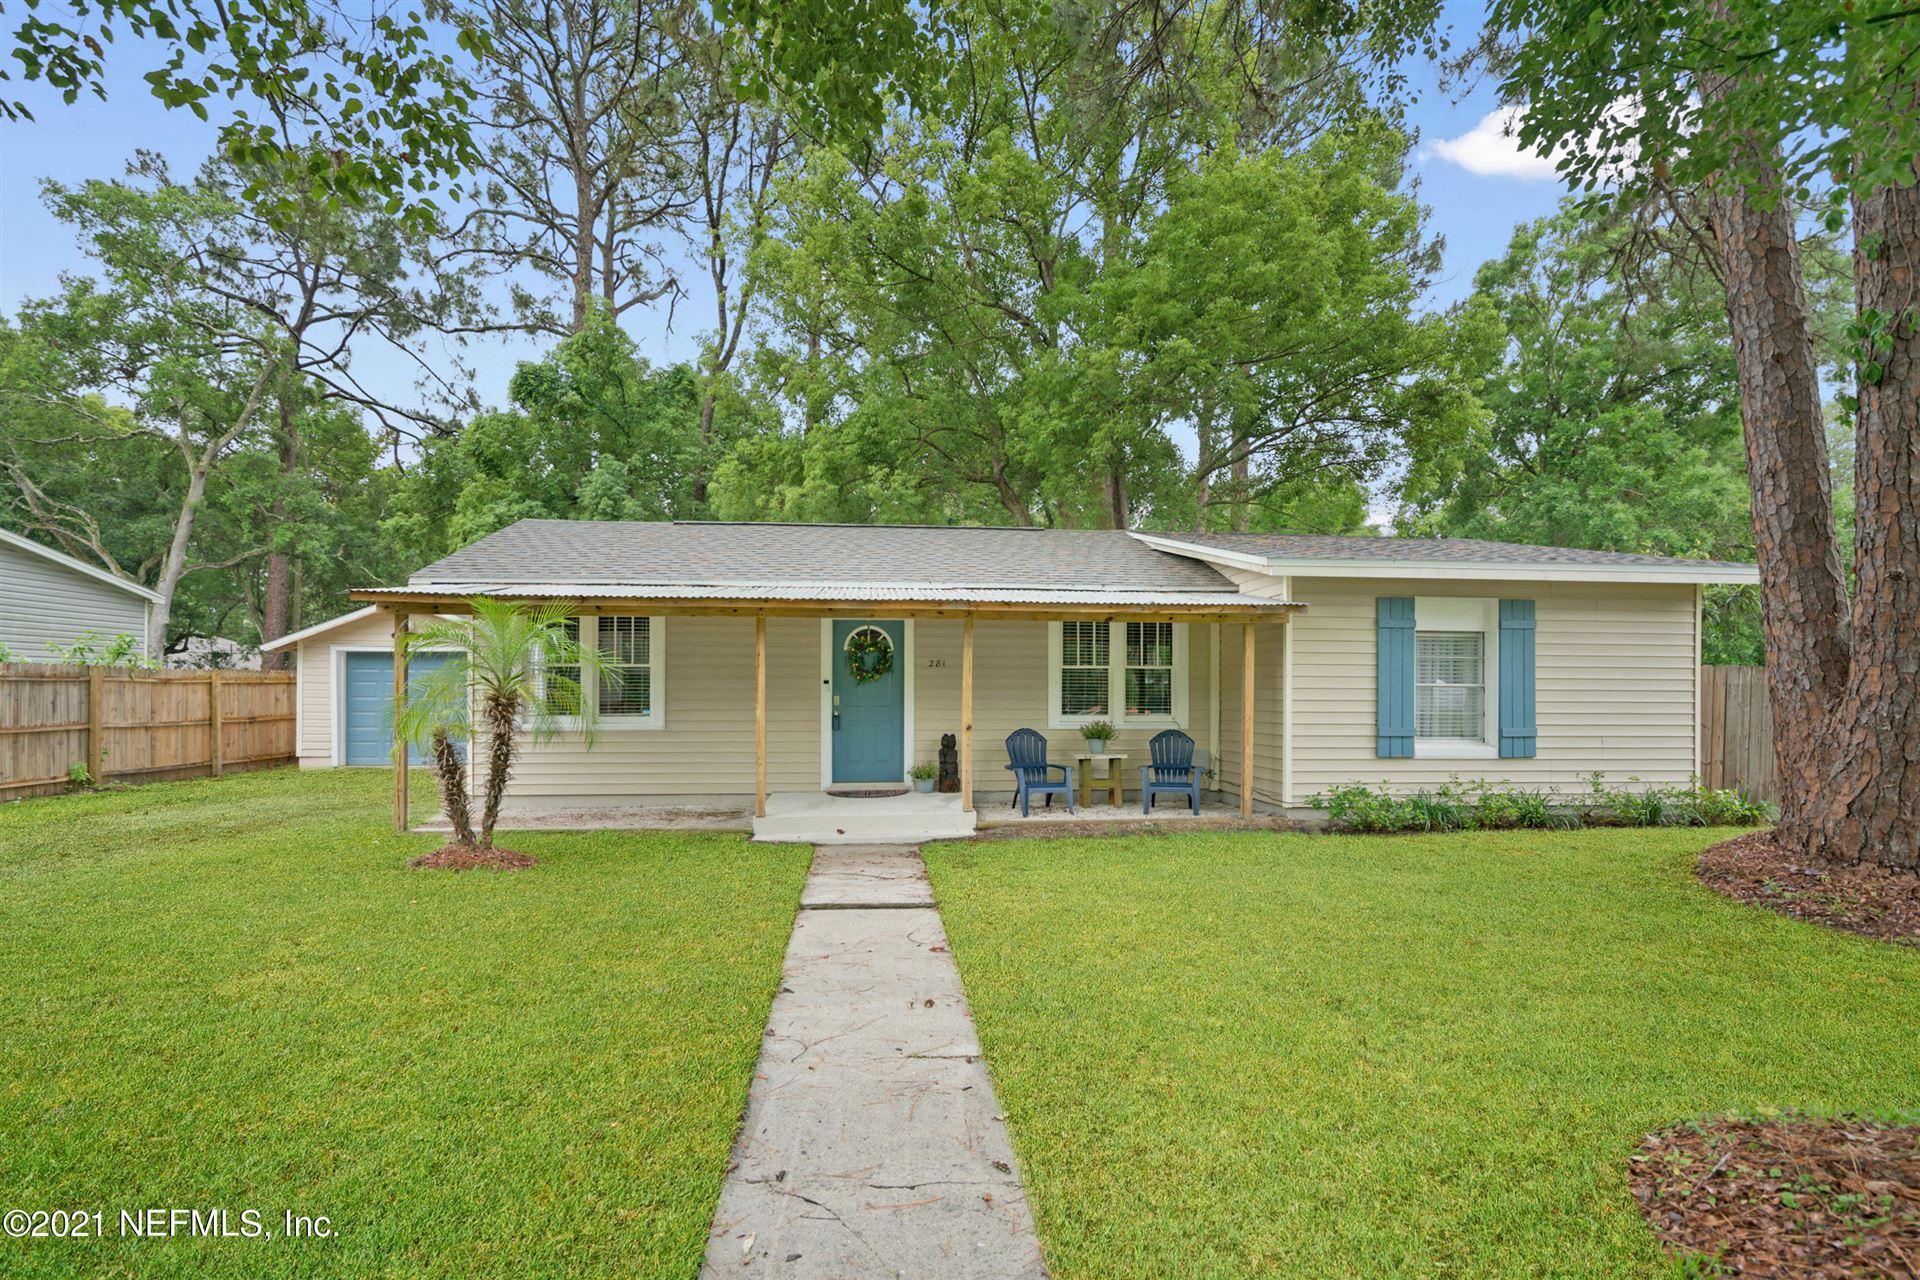 281 COVINO AVE, Saint Augustine, FL 32084 - MLS#: 1110172